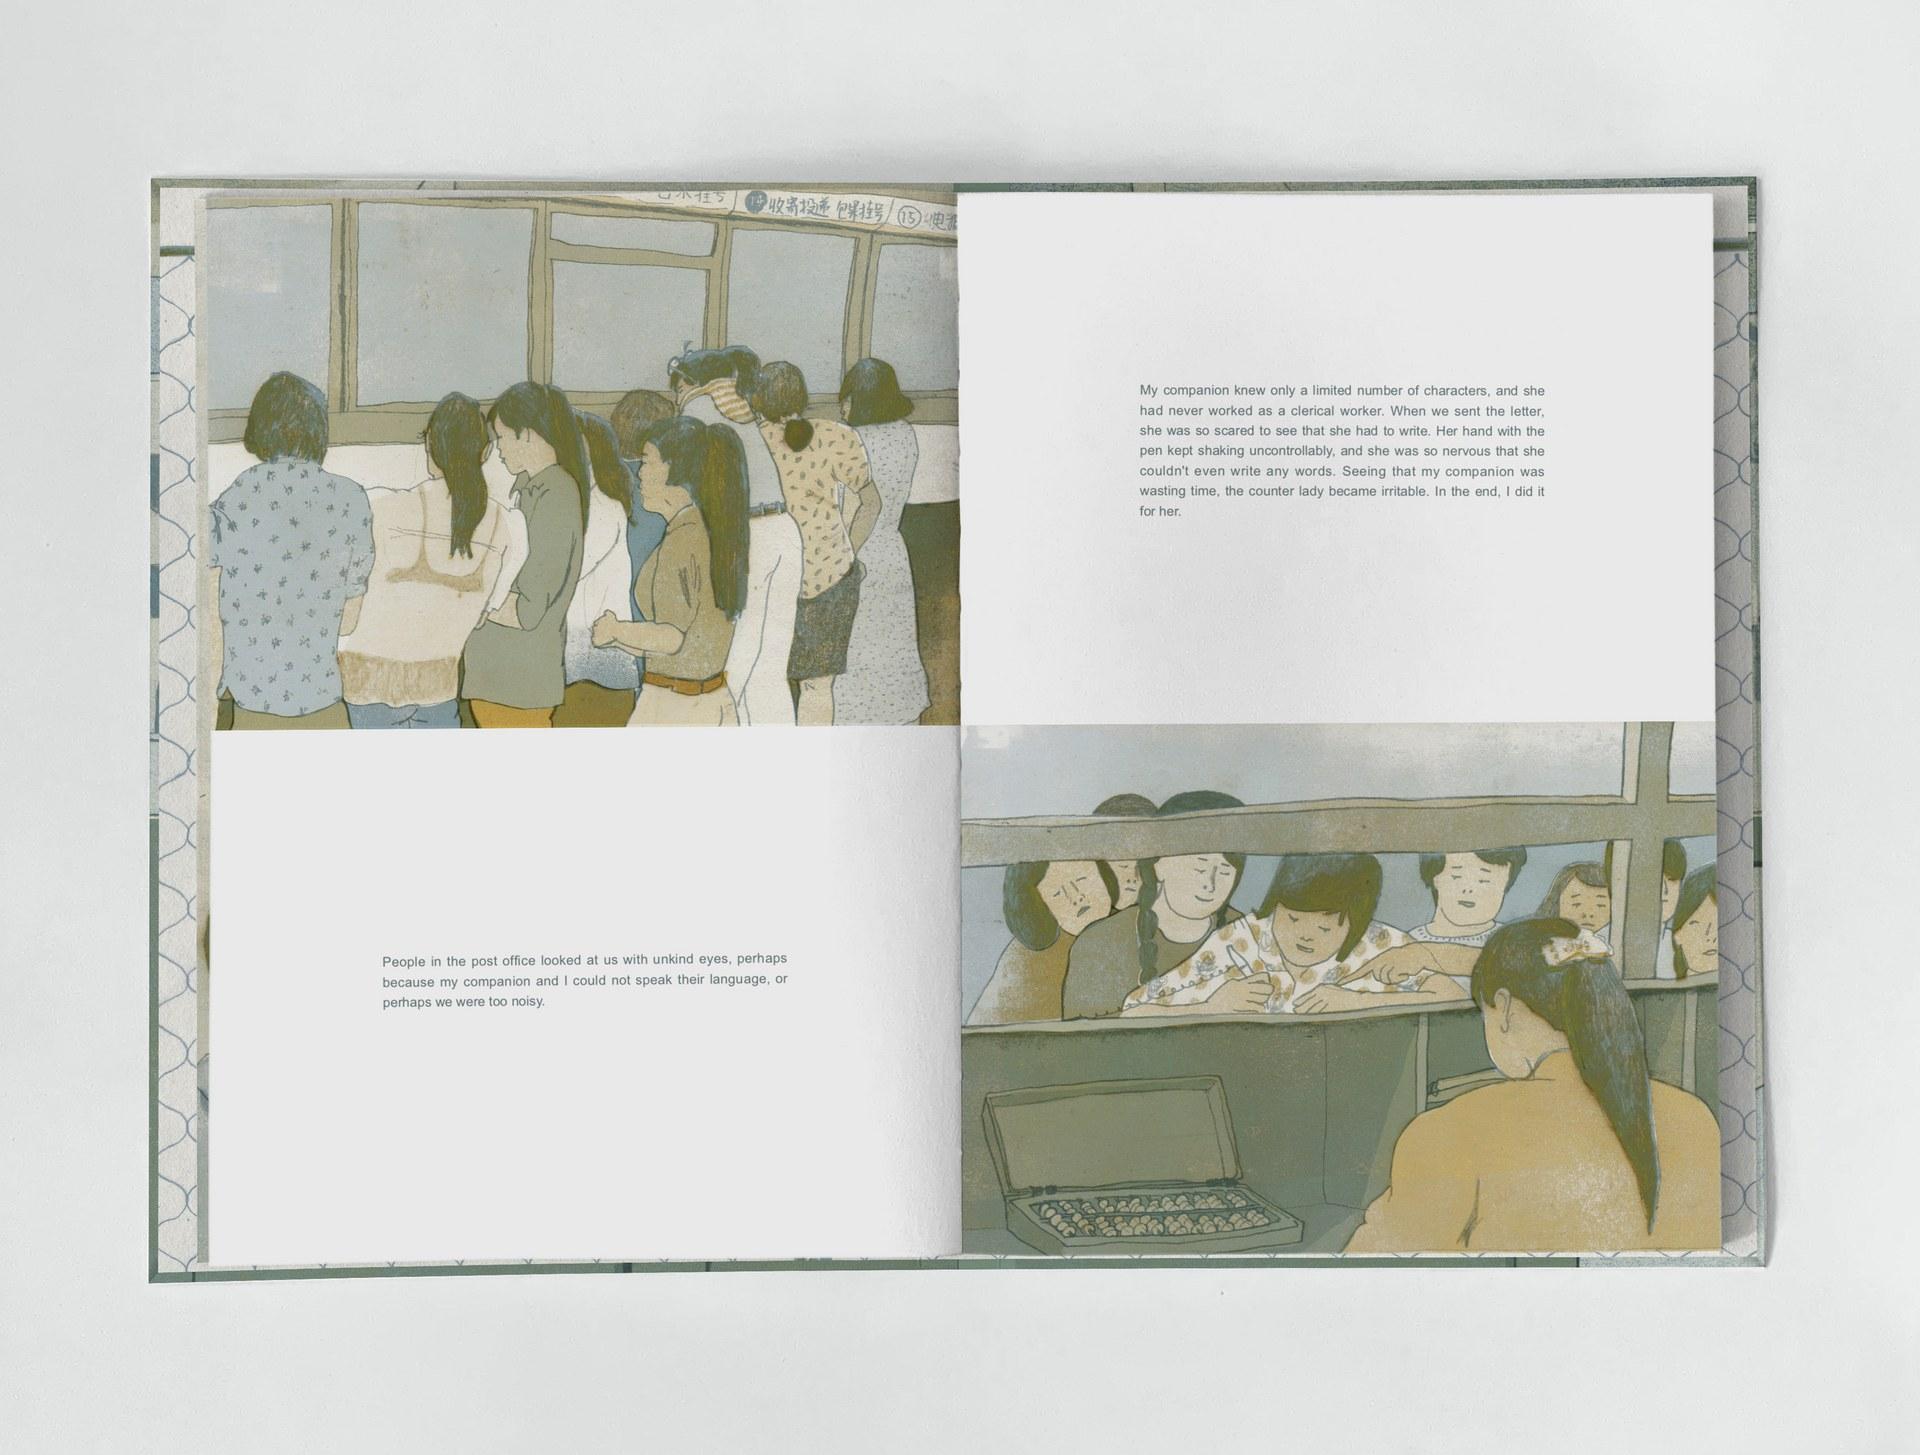 pp.62-63